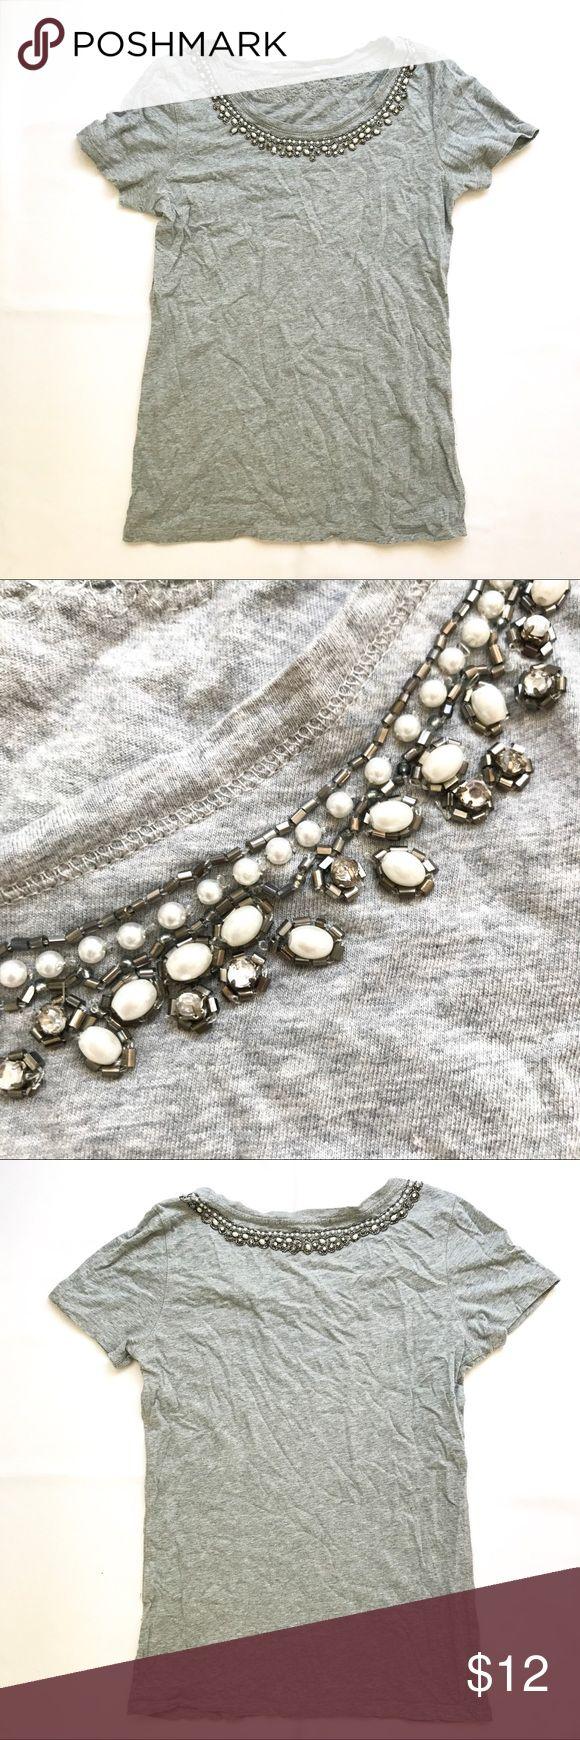 Lucky Brand tee Lucky Brand tee with collar embellishment Lucky Brand Tops Tees - Short Sleeve